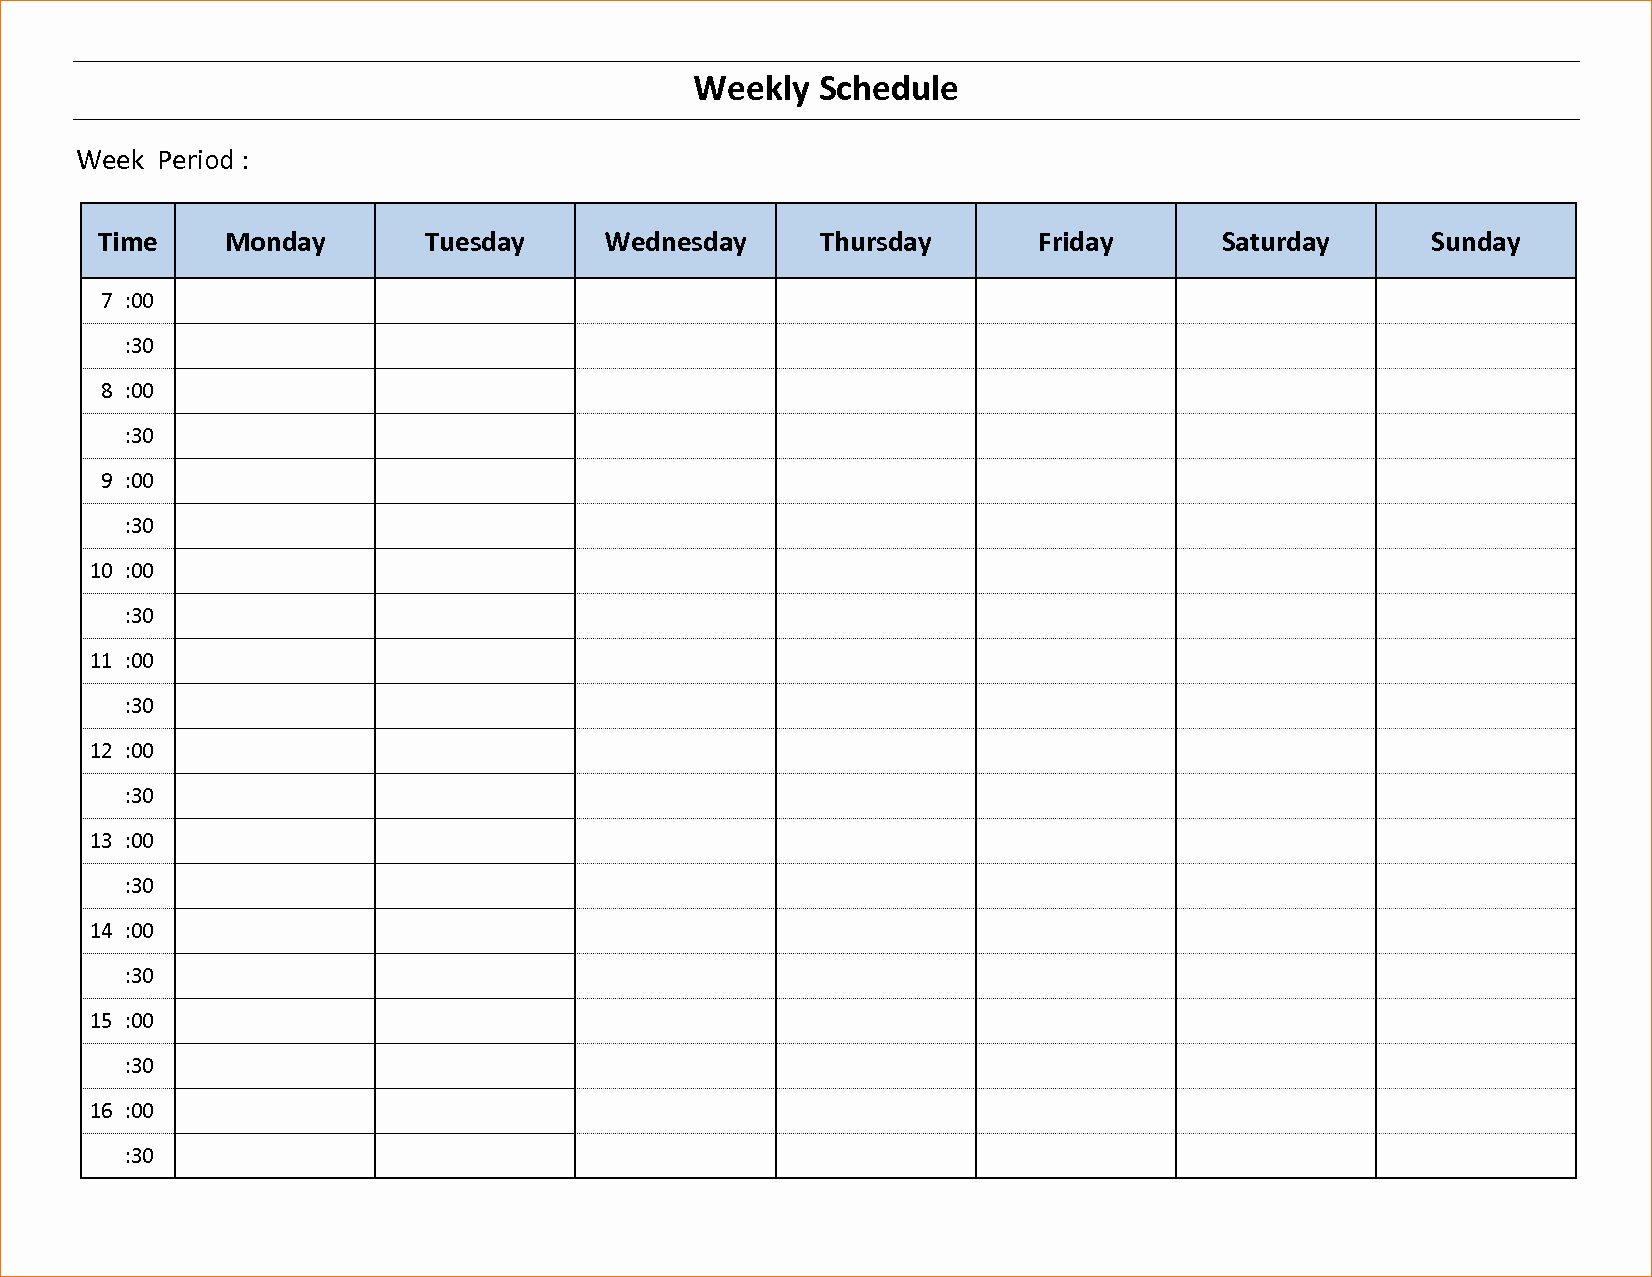 Work Week Schedule Template New Calendar by Week Template Driverlayer Search Engine